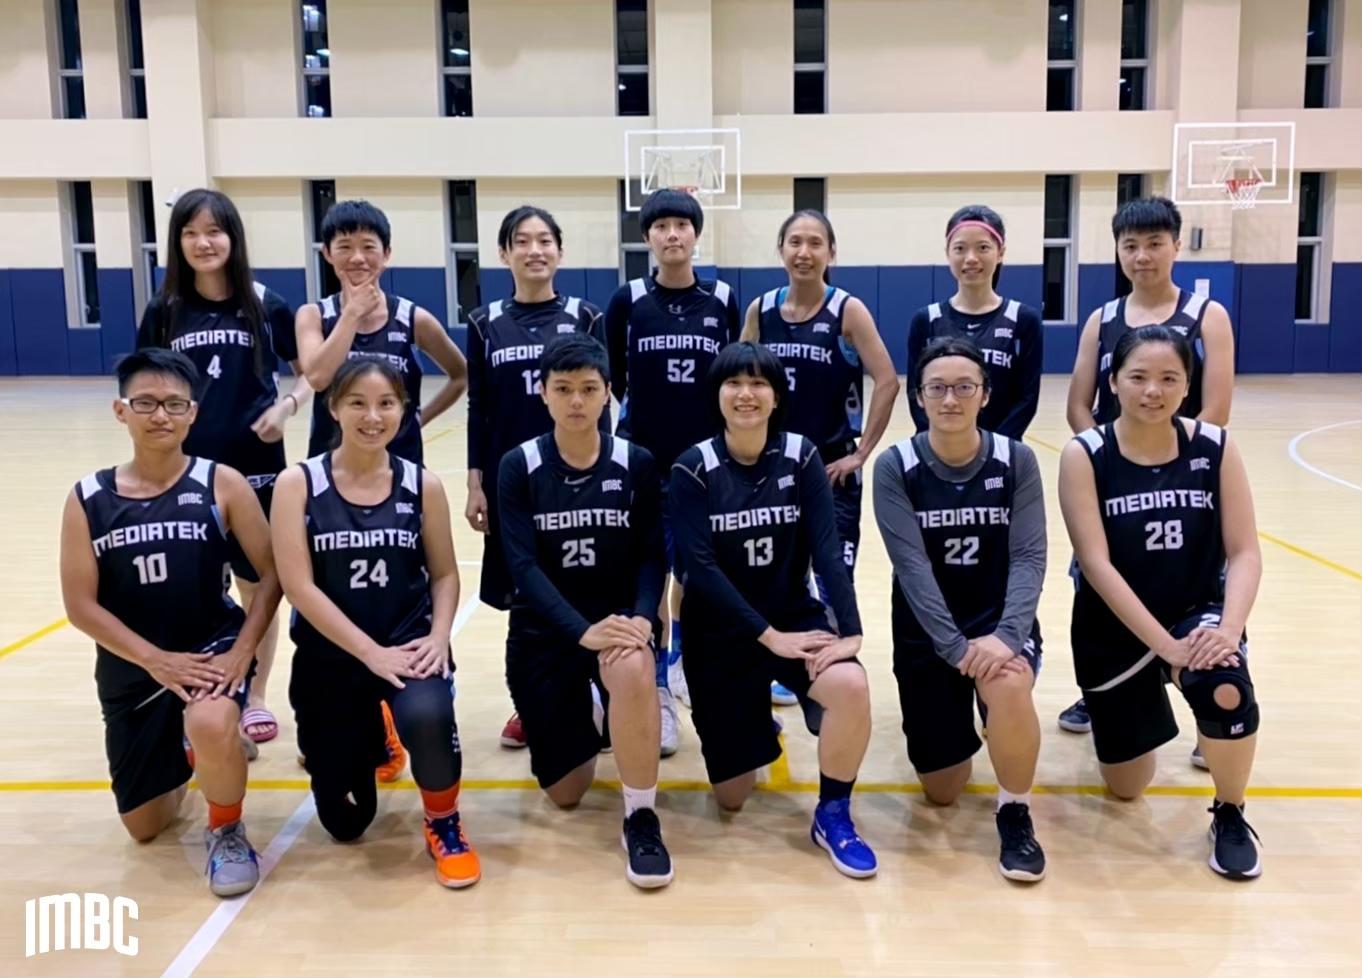 mediatek-basketball-jersey